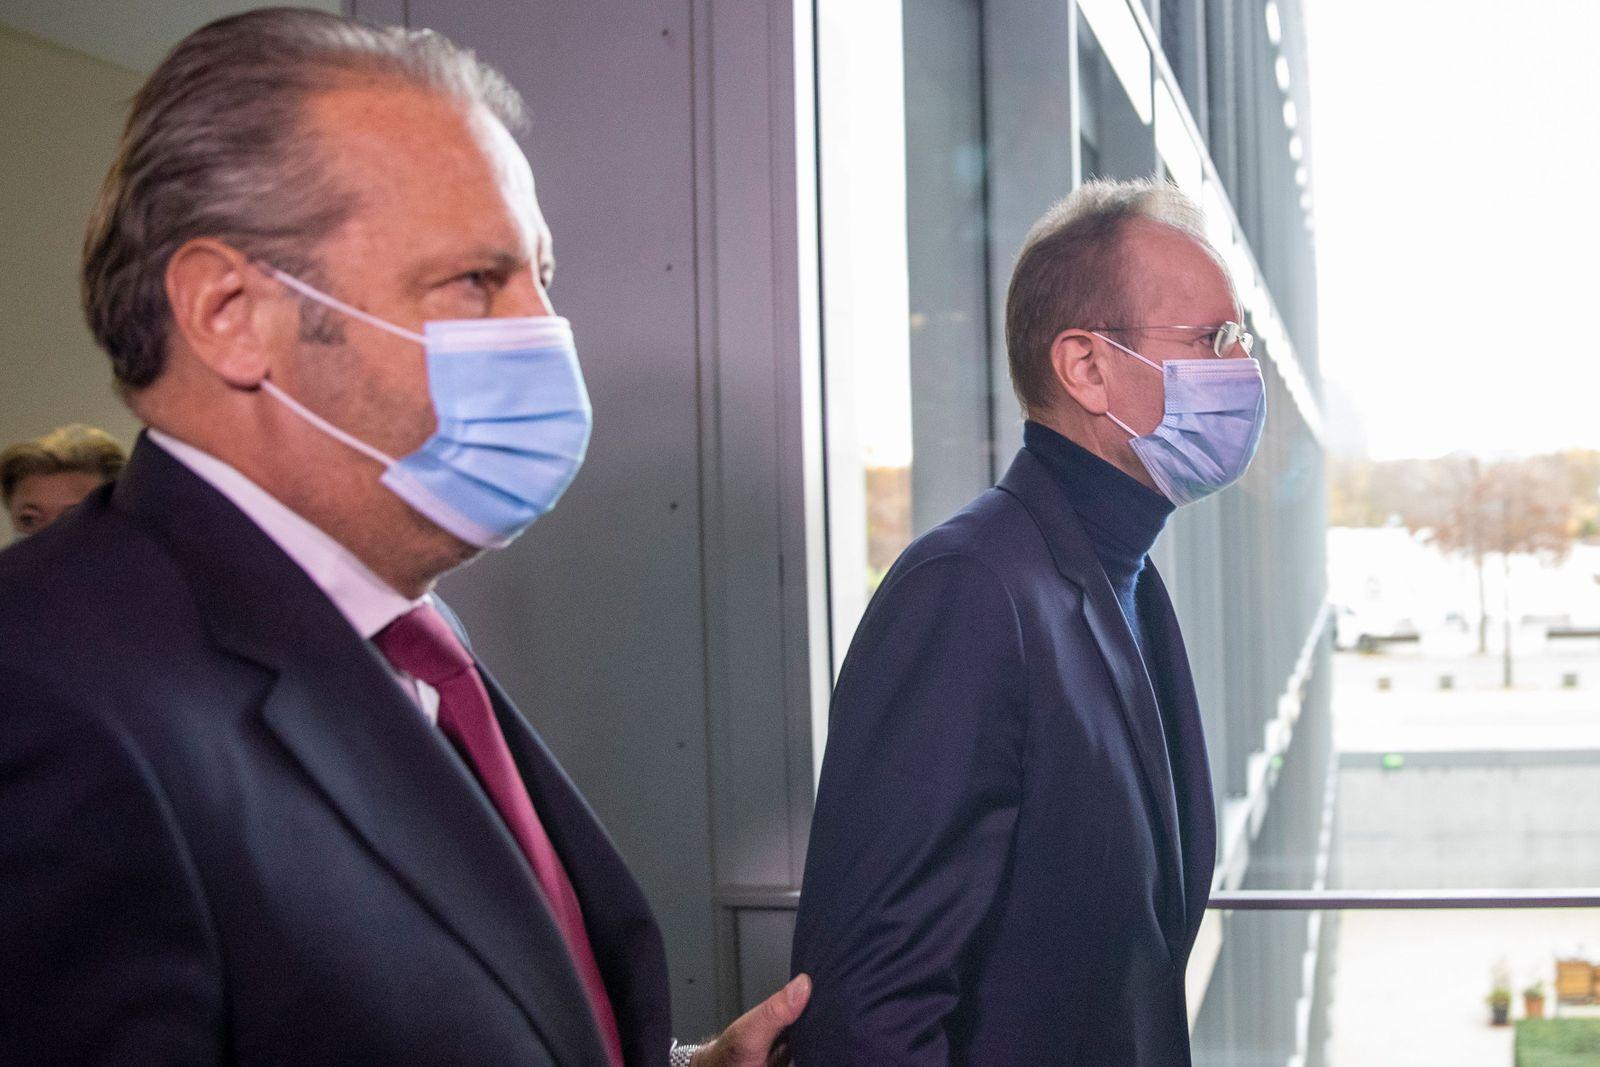 Markus Braun Testifies In Wirecard Commission, Berlin, Germany - 19 Nov 2020